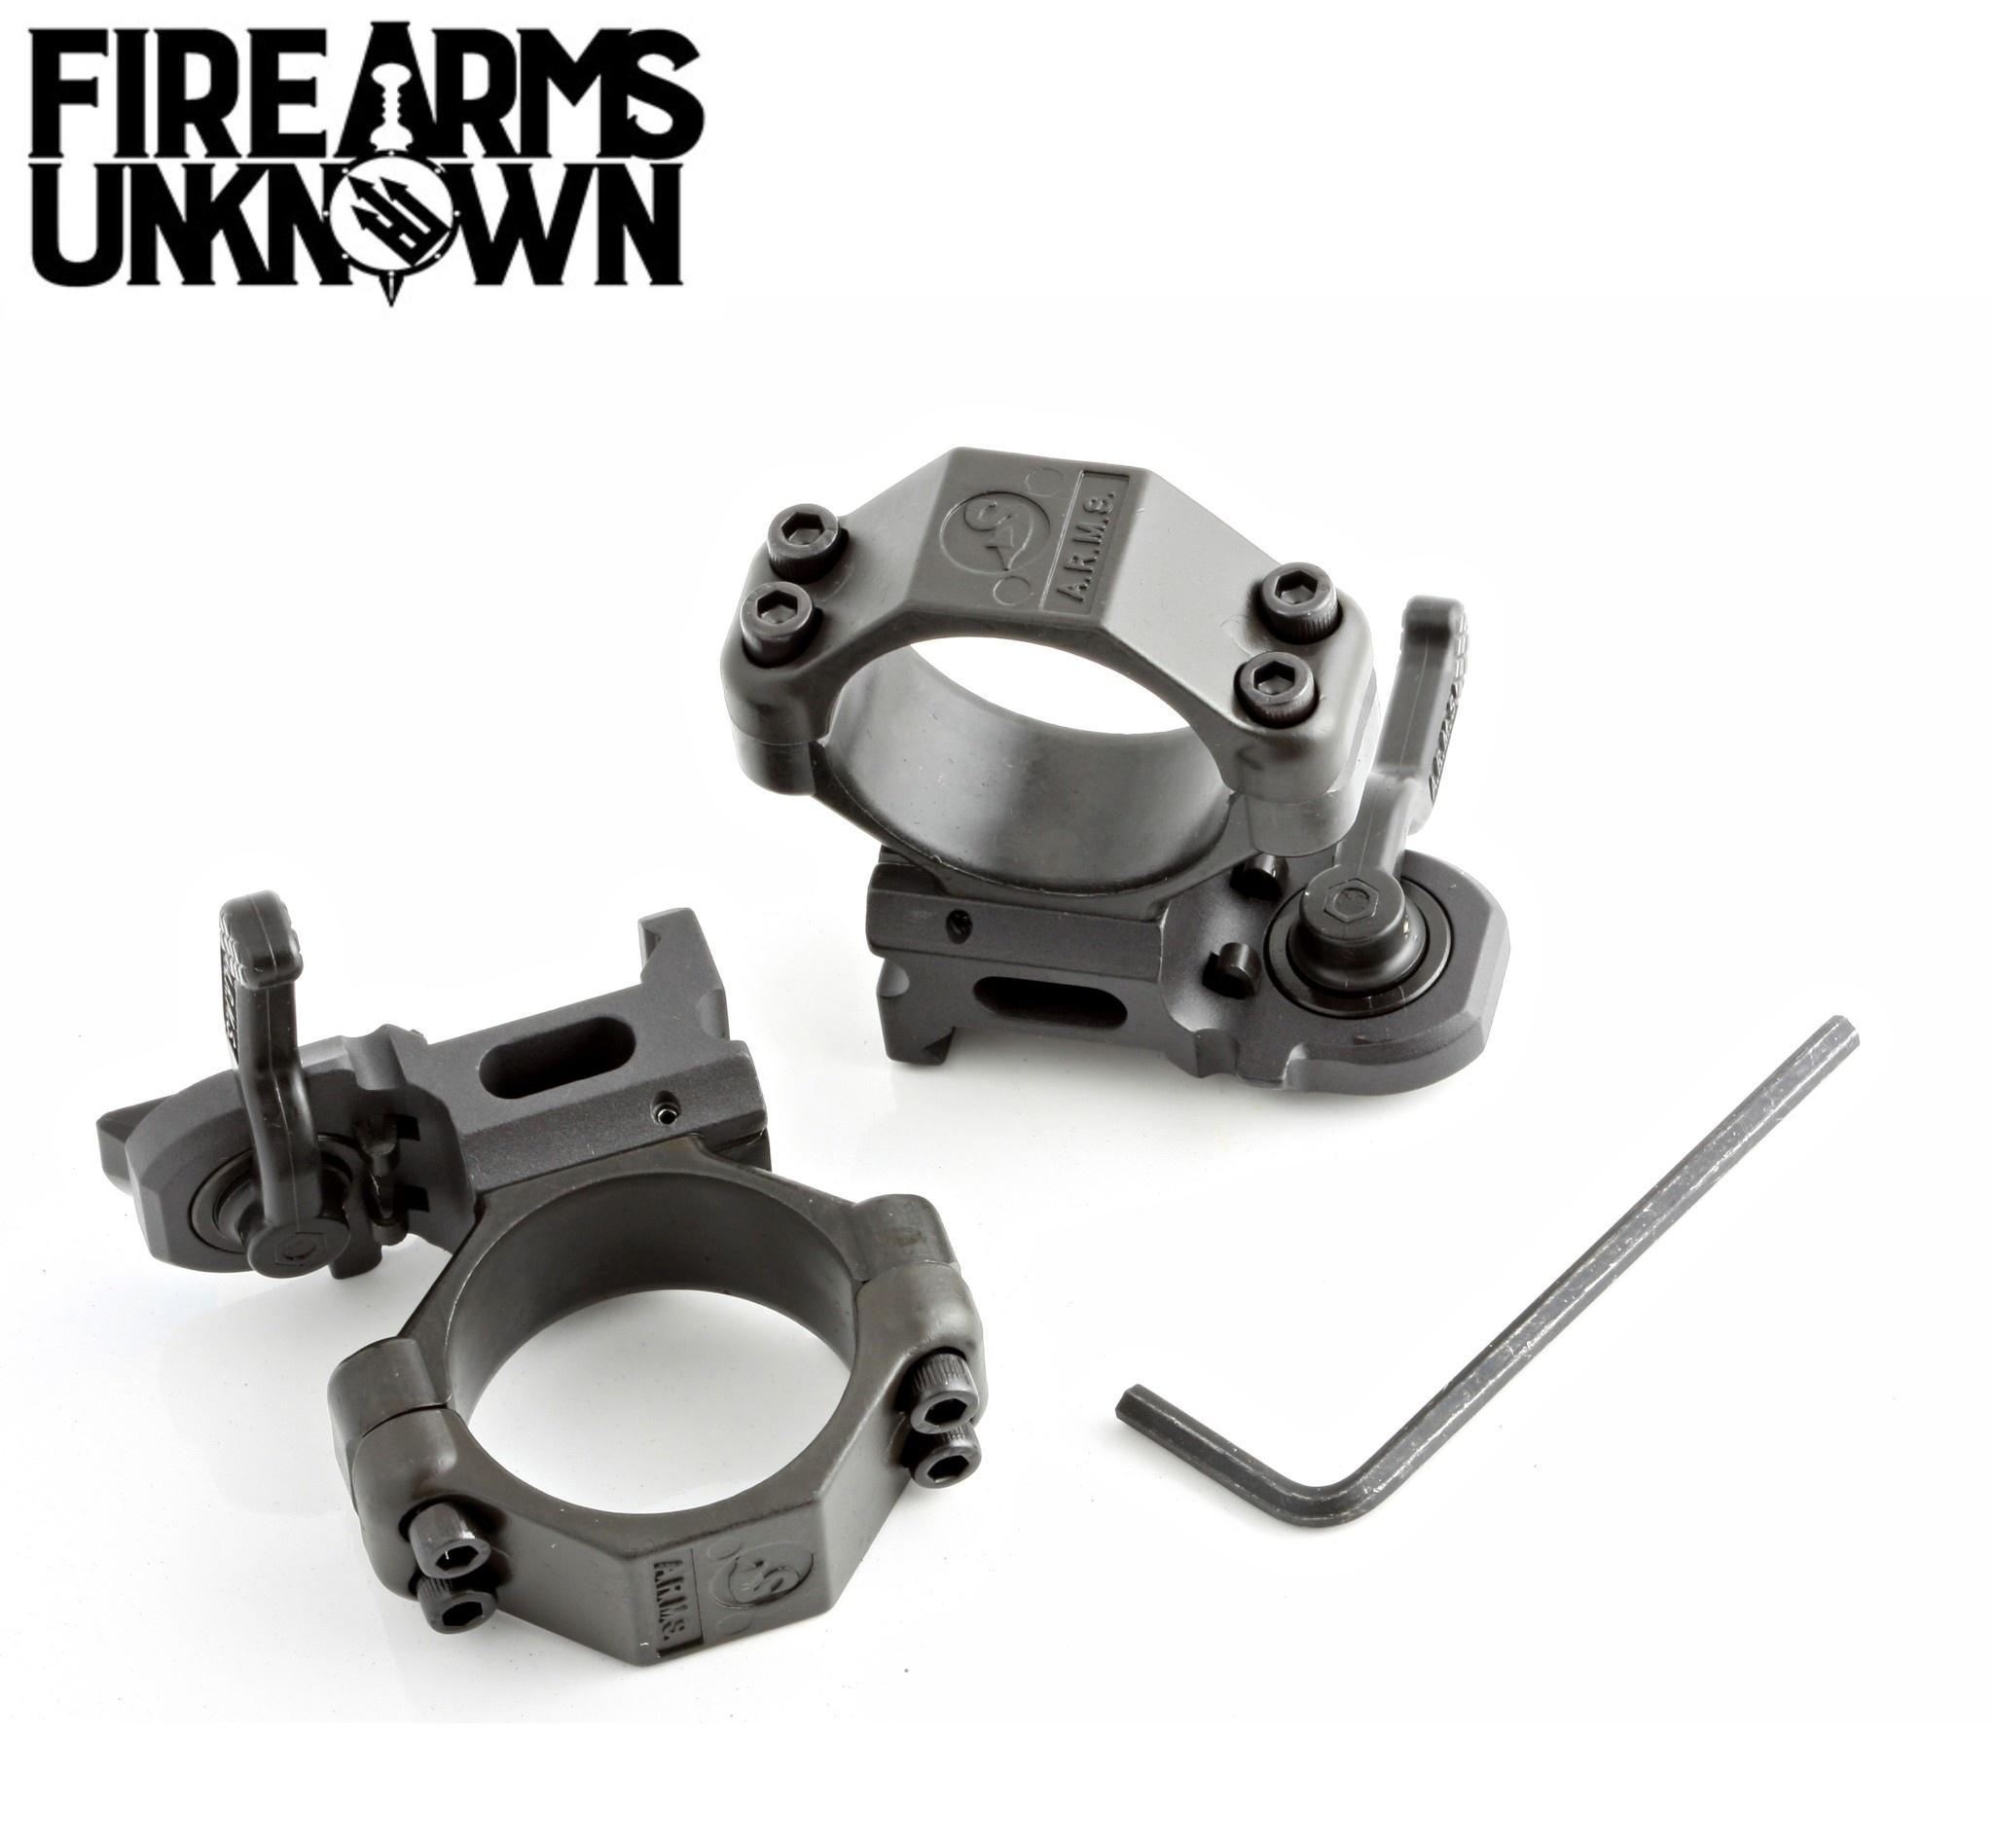 ARMS #22 Throw Lever Scope Rings 30MM Medium